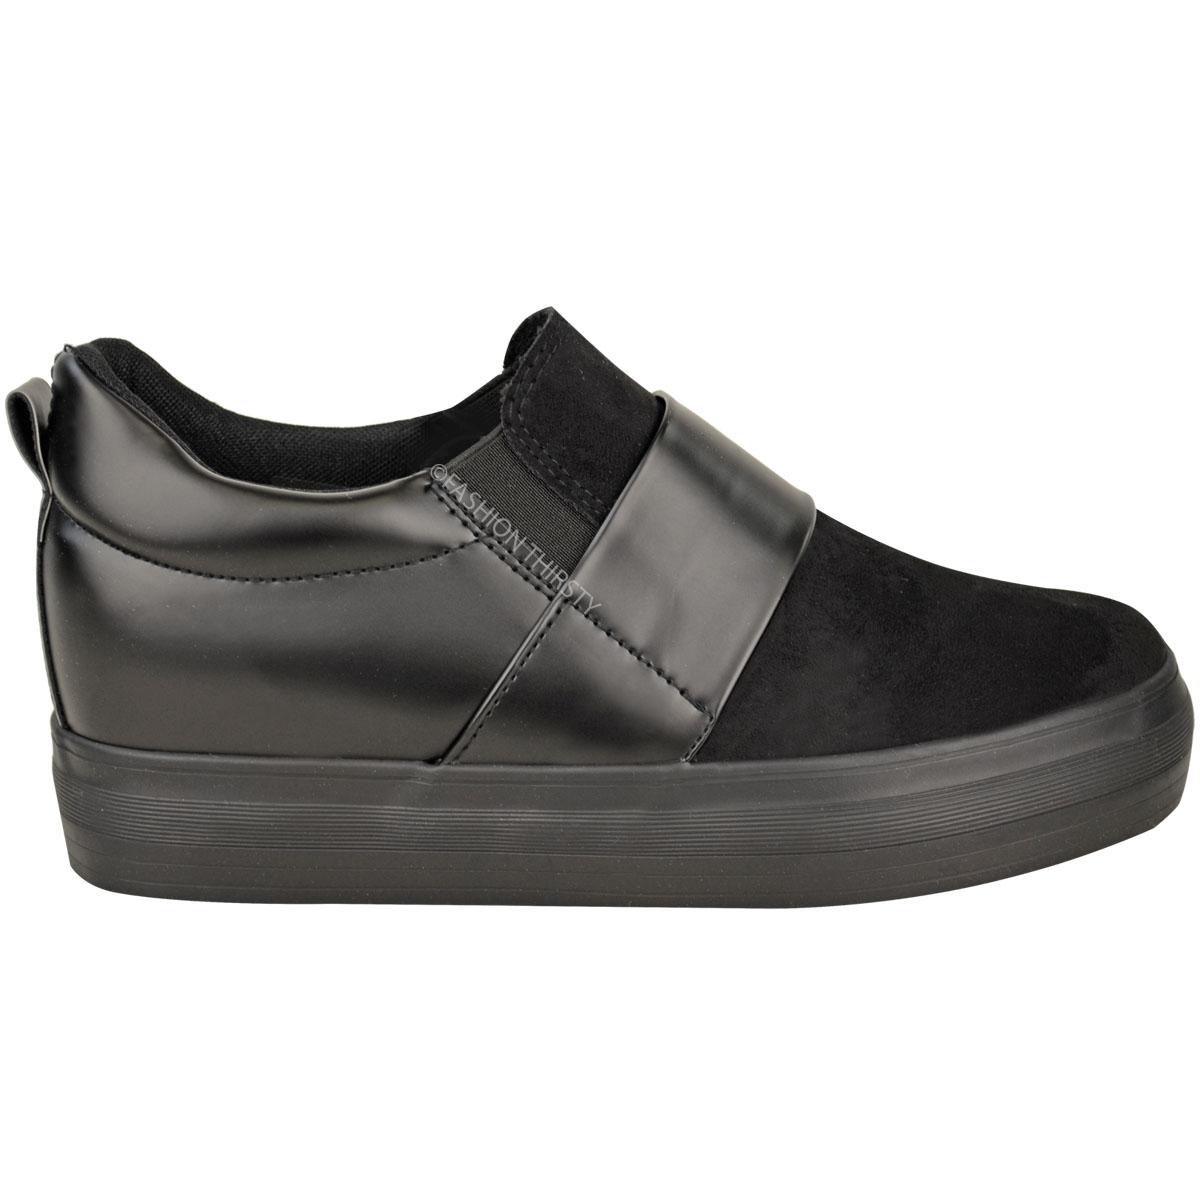 Luxury  Clothing Shoes Amp Accessories  Women39s Shoes  Sandals Amp Fli